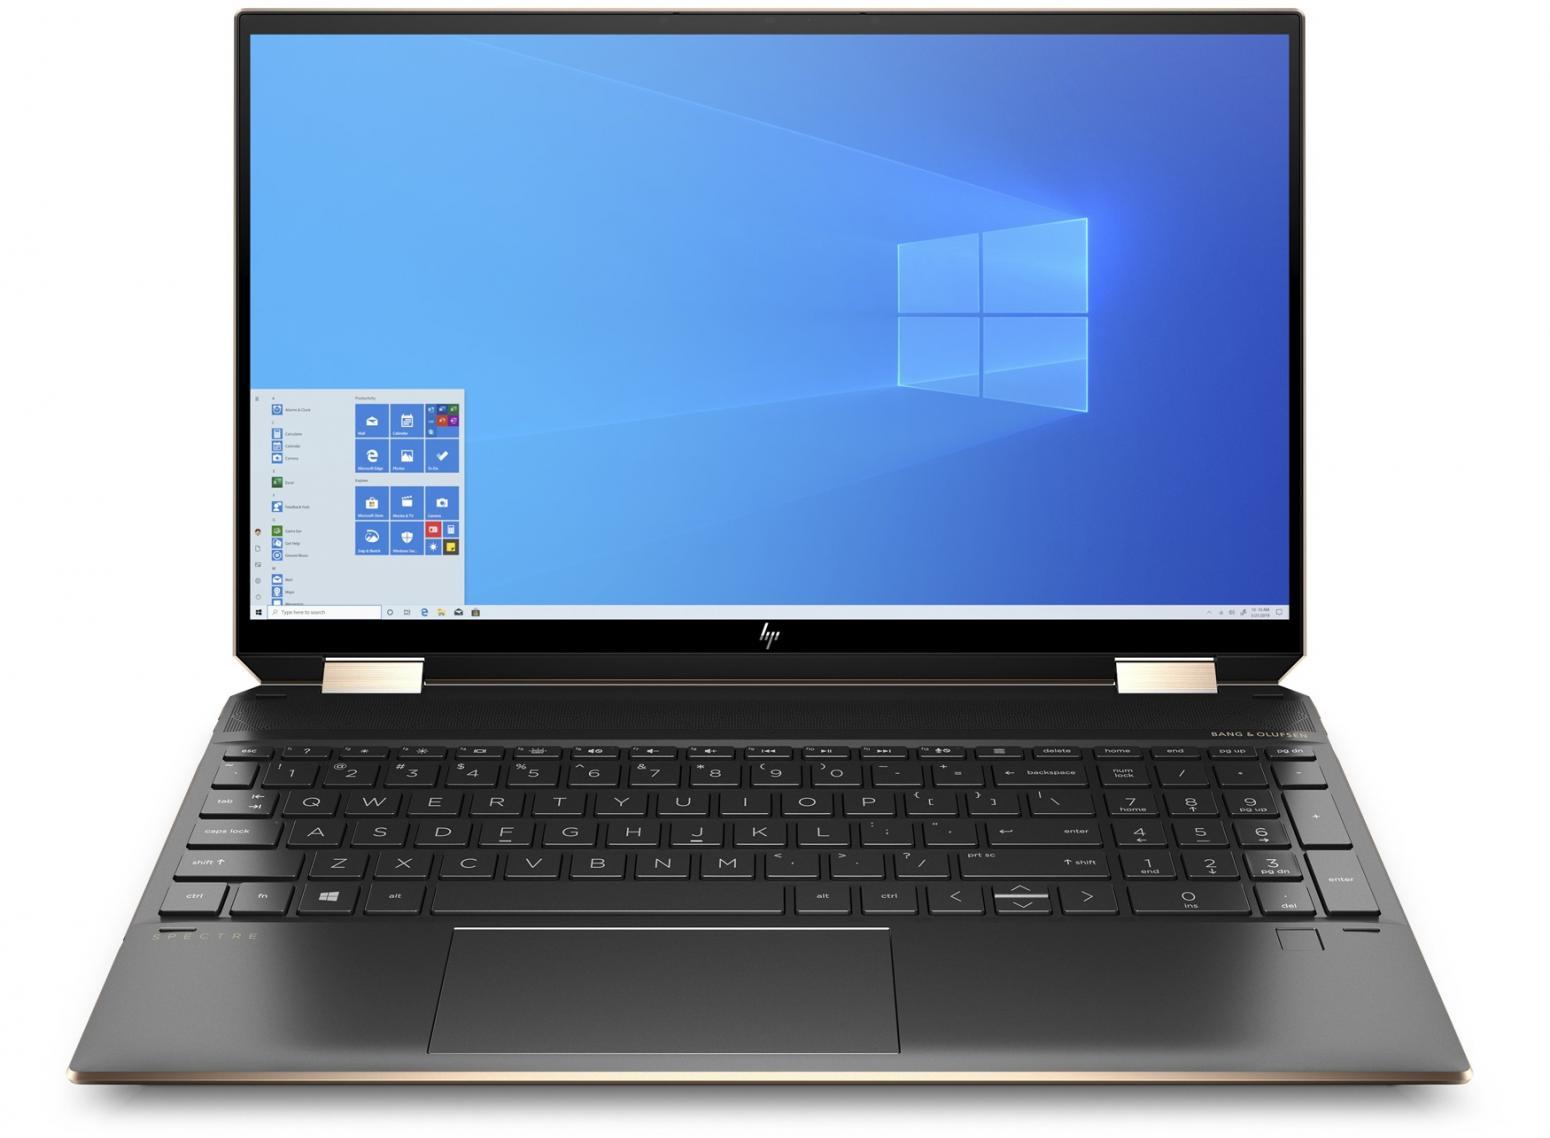 Ordinateur portable HP Spectre x360 15-eb0013nf Noir - Tactile 4K OLED, GTX 1650 Ti Max-Q - photo 5